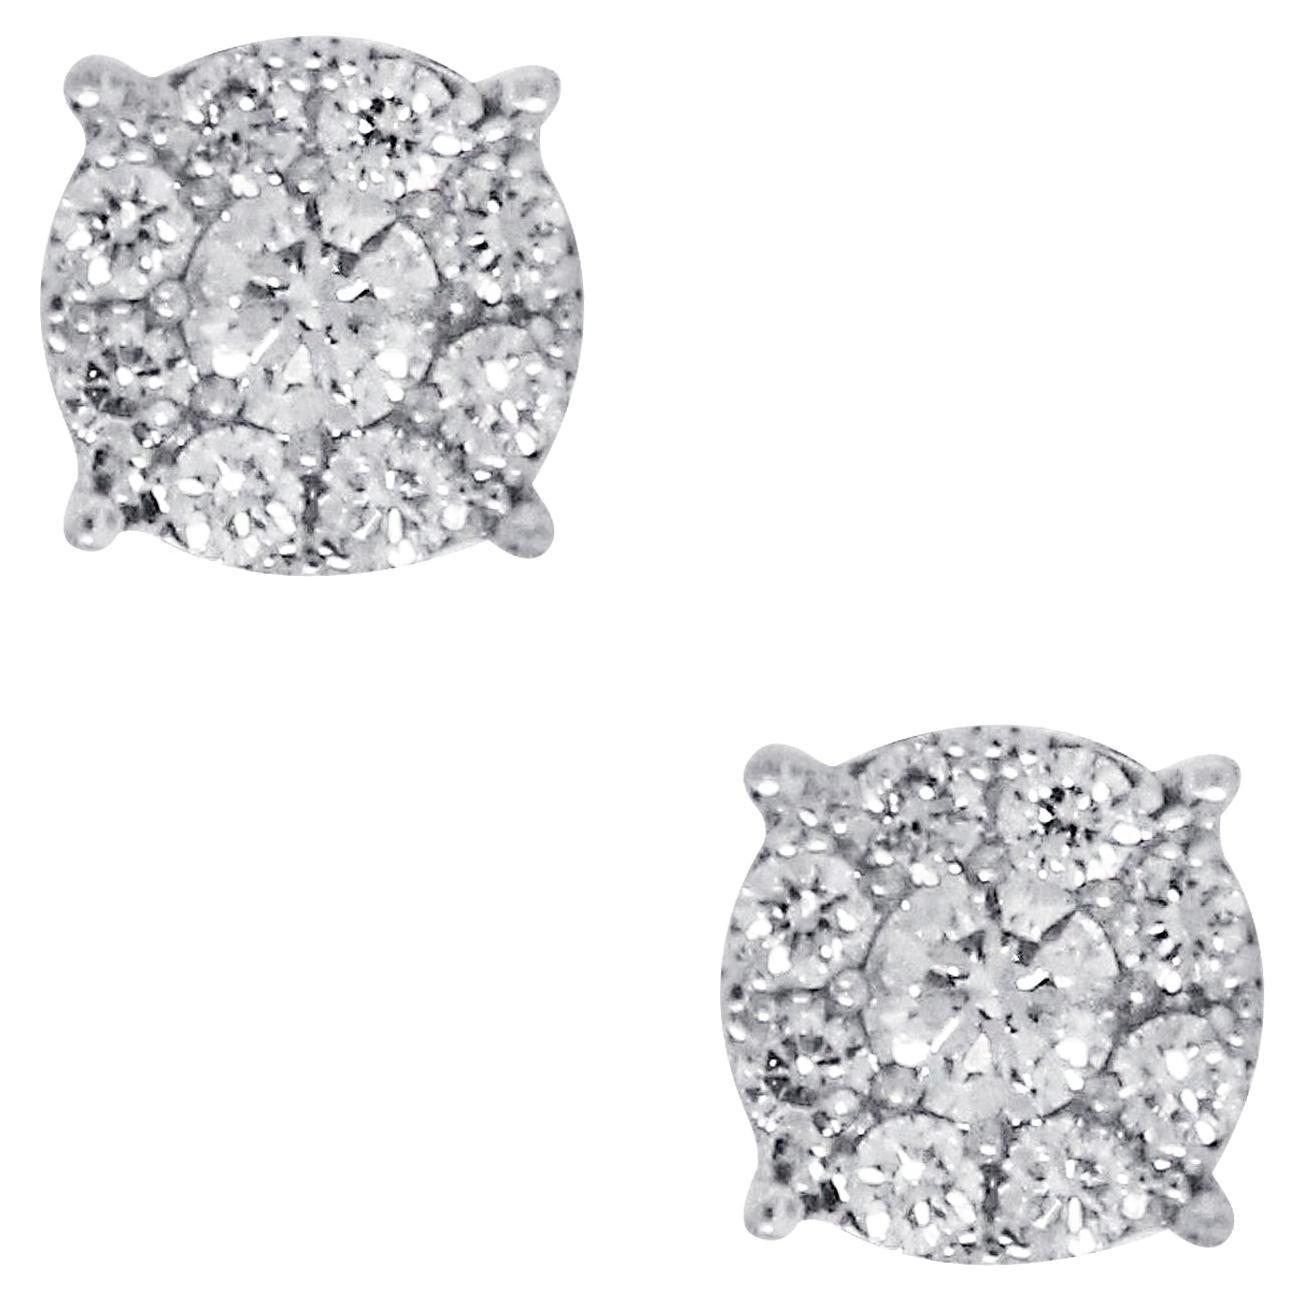 0.52 Carat Diamond Cluster Earrings